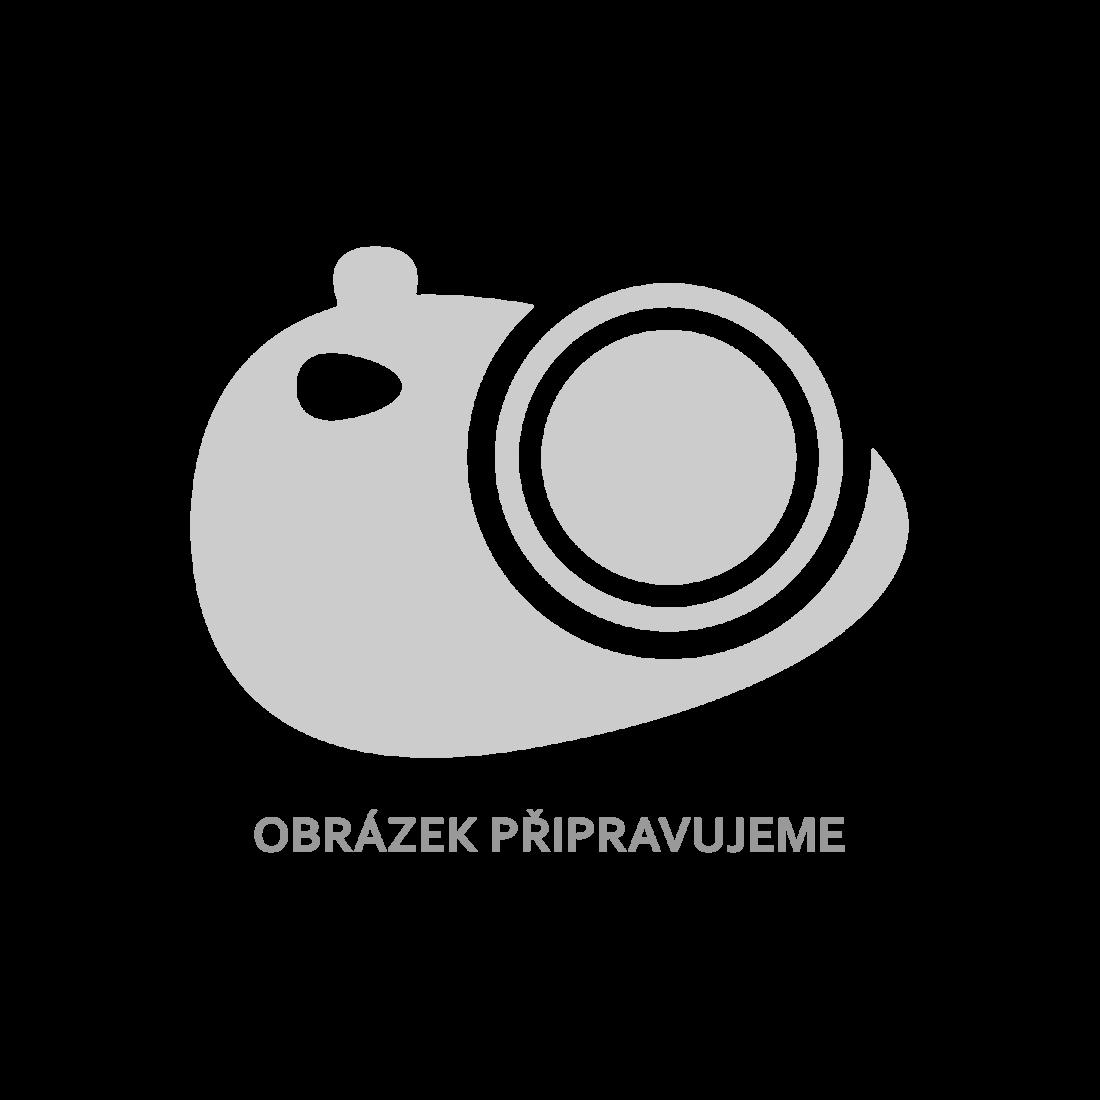 vidaXL Ručně pletený sedací puf tmavě šedo-bílý 50 x 35 cm vlna [287607]